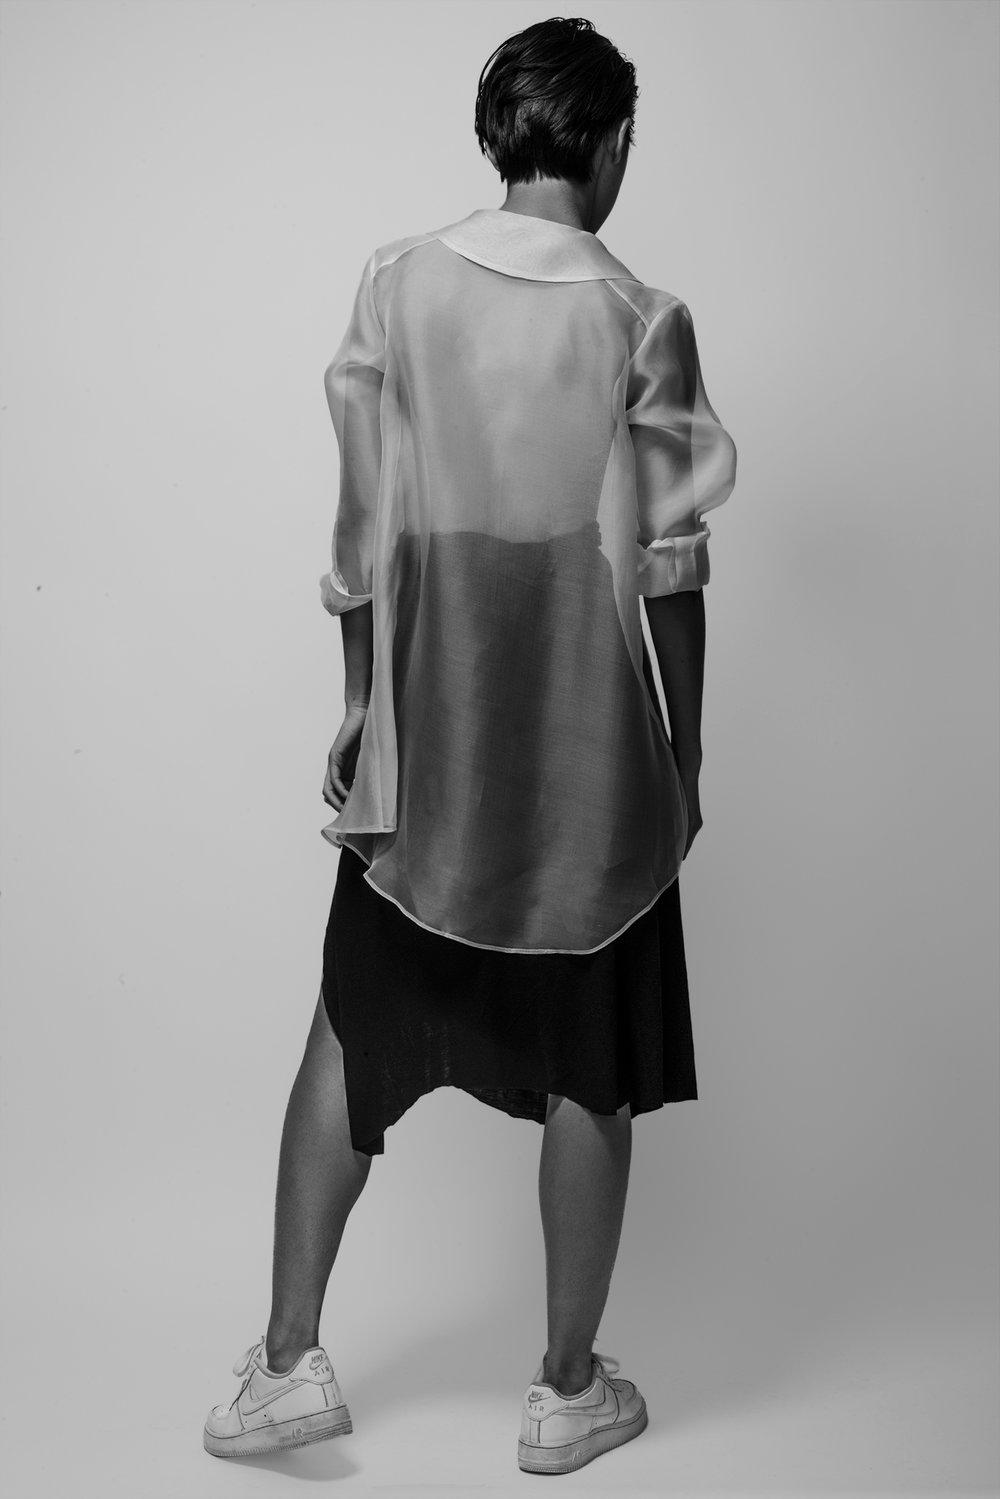 Photographer: Allen Chiu Model: Yanjin Li Stylist: Jasmine Kim Make up and hair artist: Christine Arndt